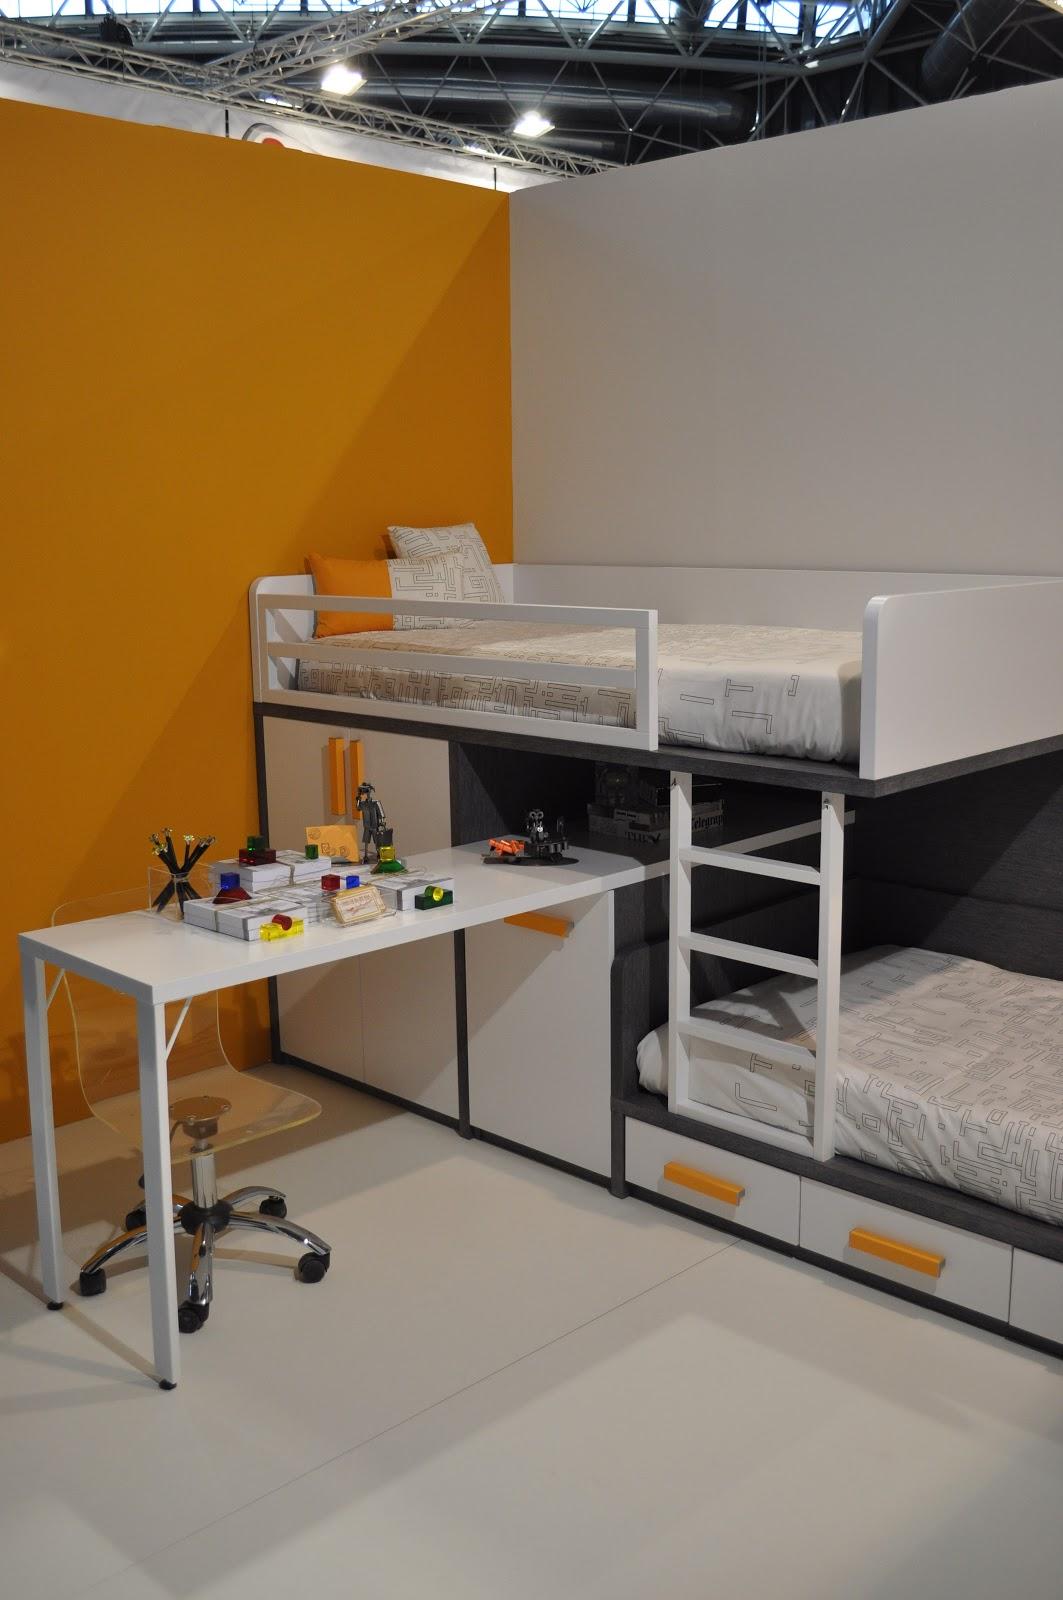 Muebles ros feria habitat programa de camas tren de for Feria de muebles